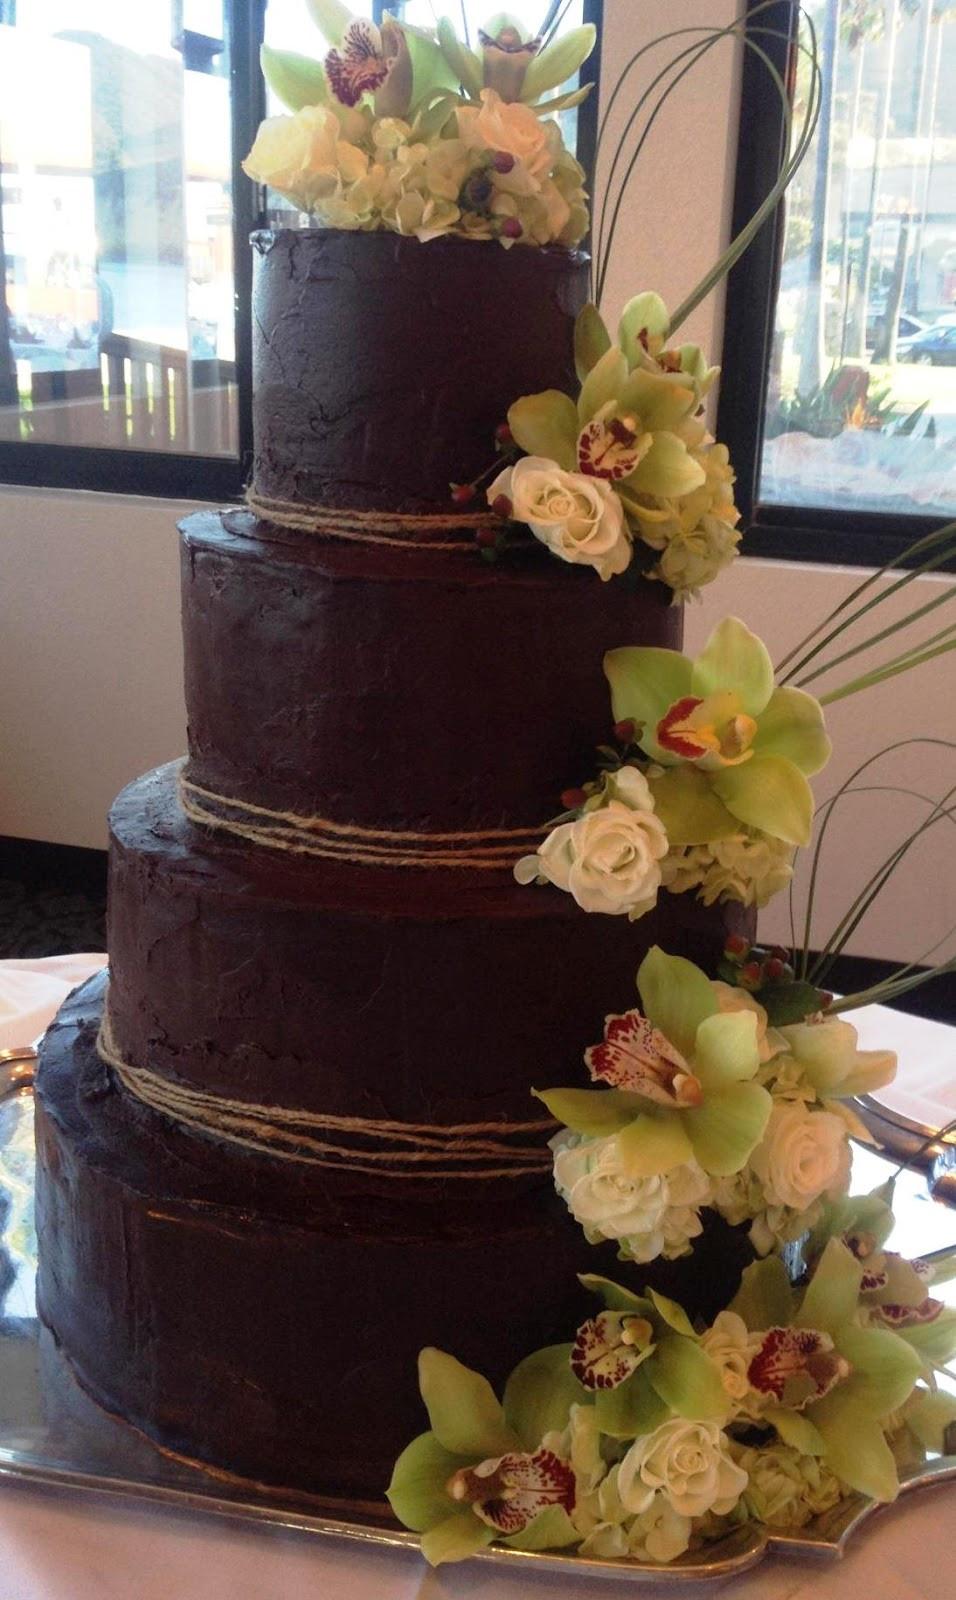 Chocolate Ganache Wedding Cakes  Cake Recipe Wedding Cake Ganache Recipe